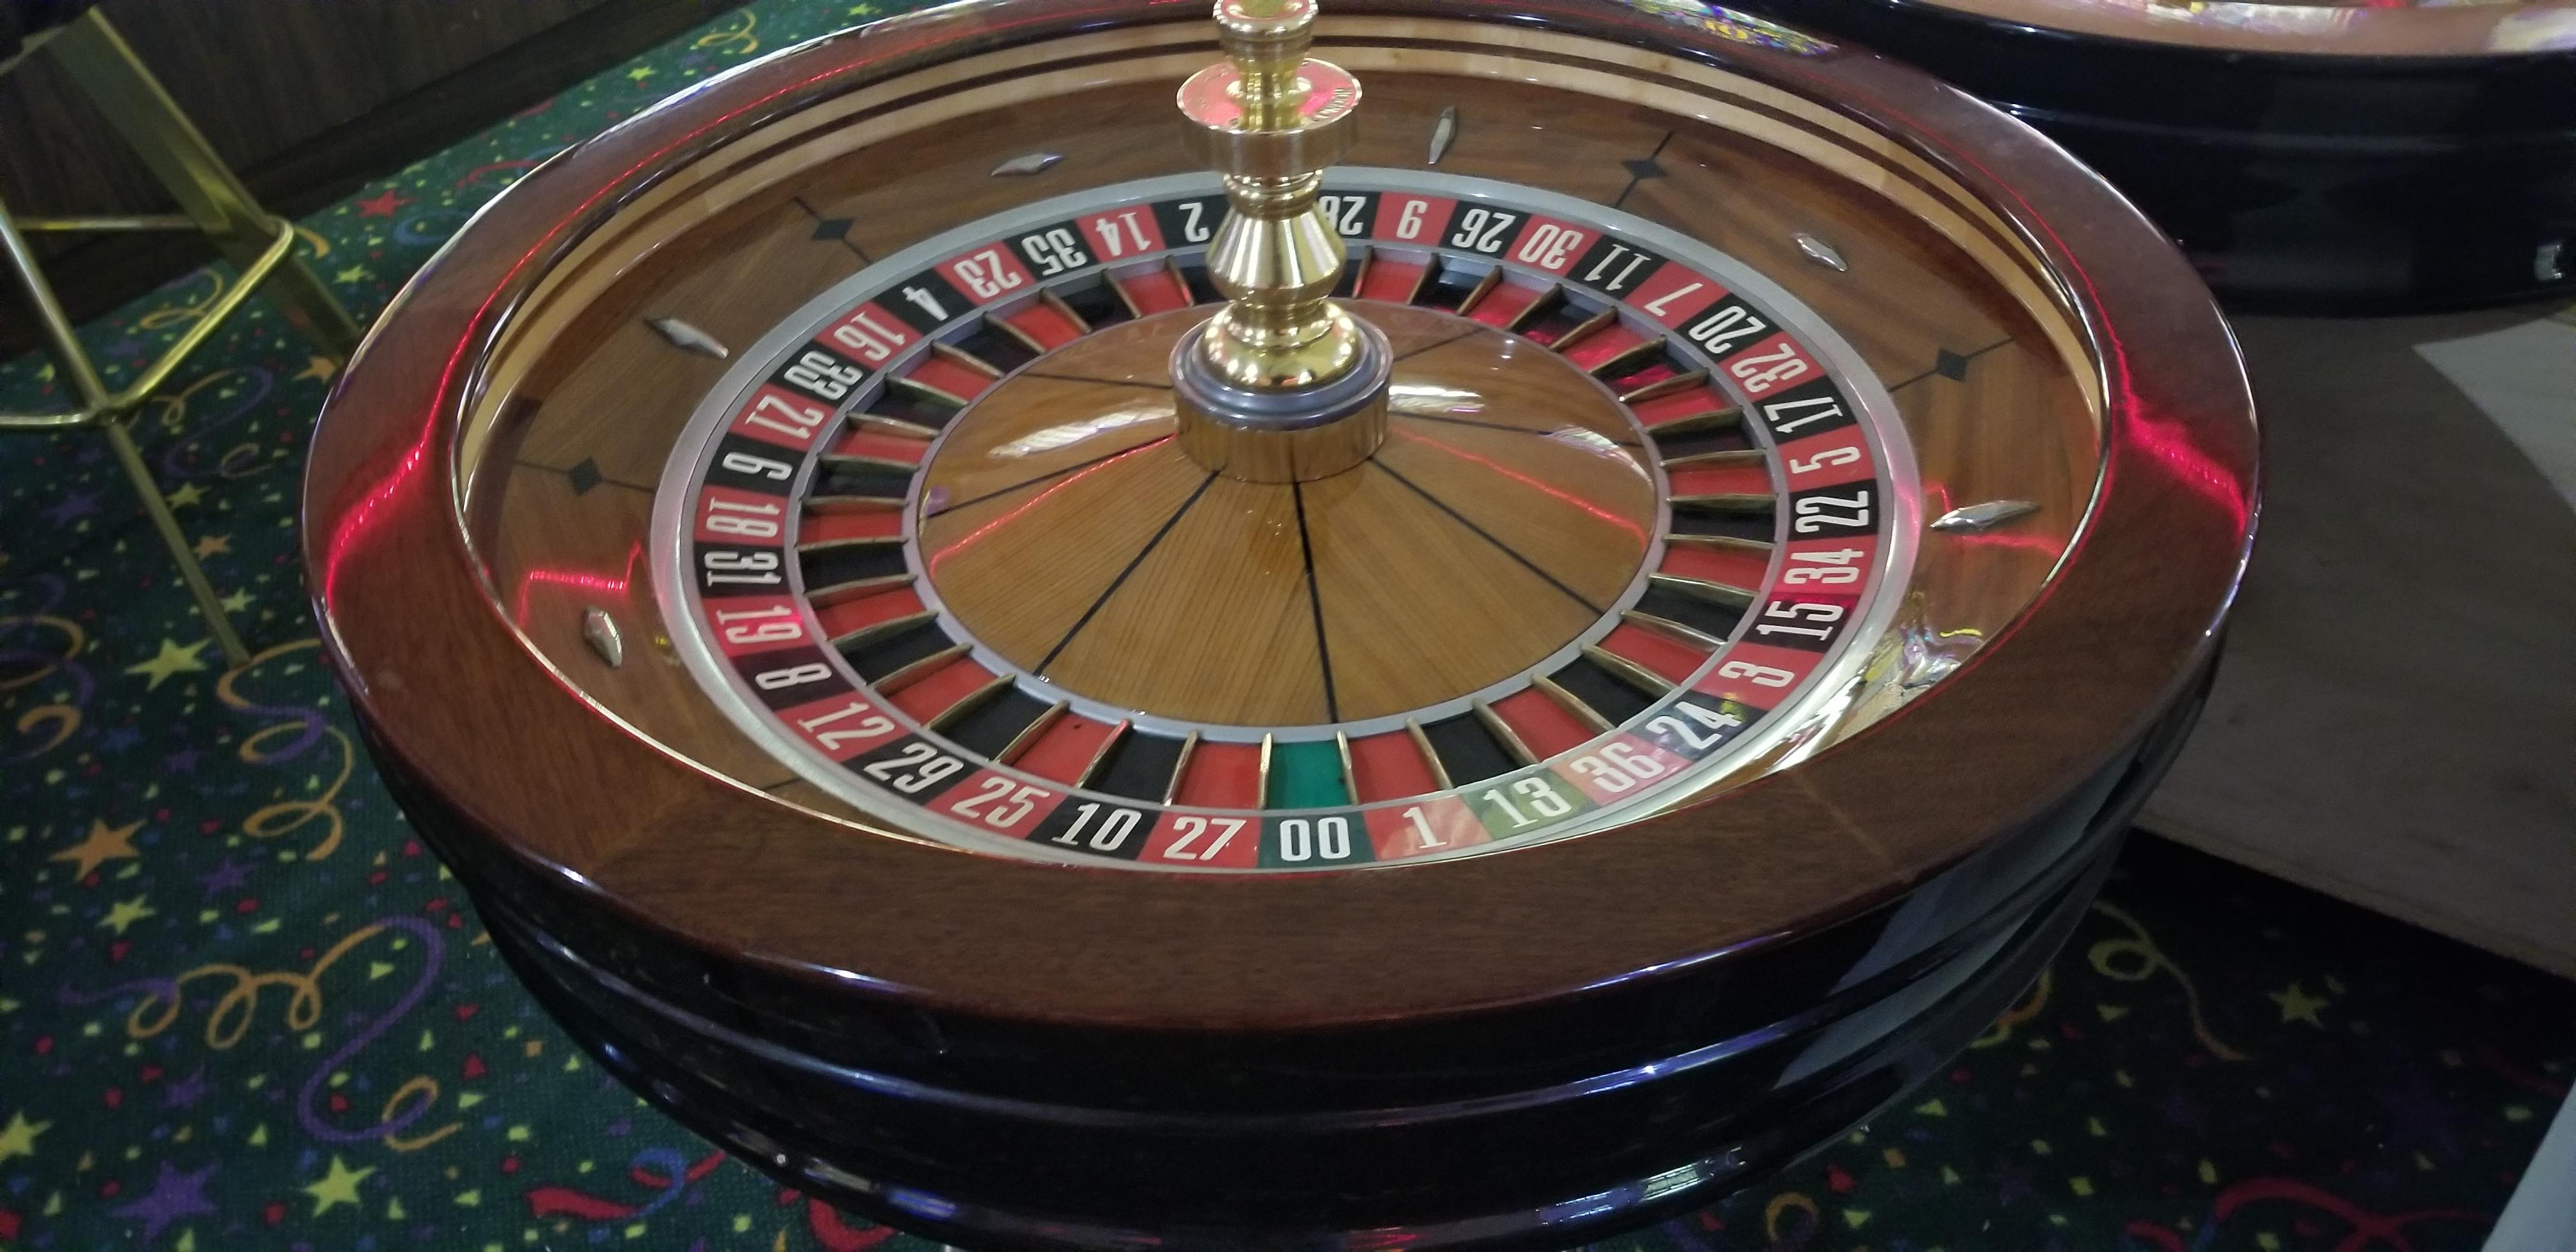 Free online mobile casino slot games